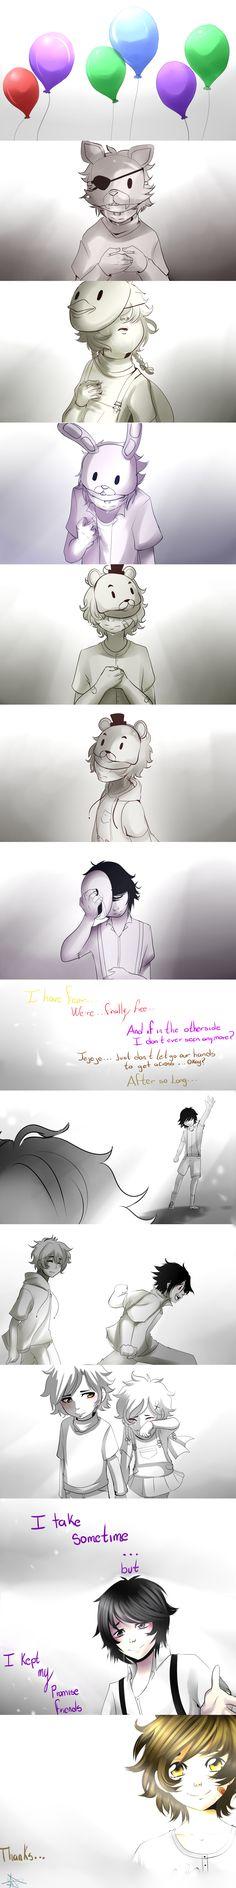 sadness and... by Kamik91.deviantart.com on @DeviantArt